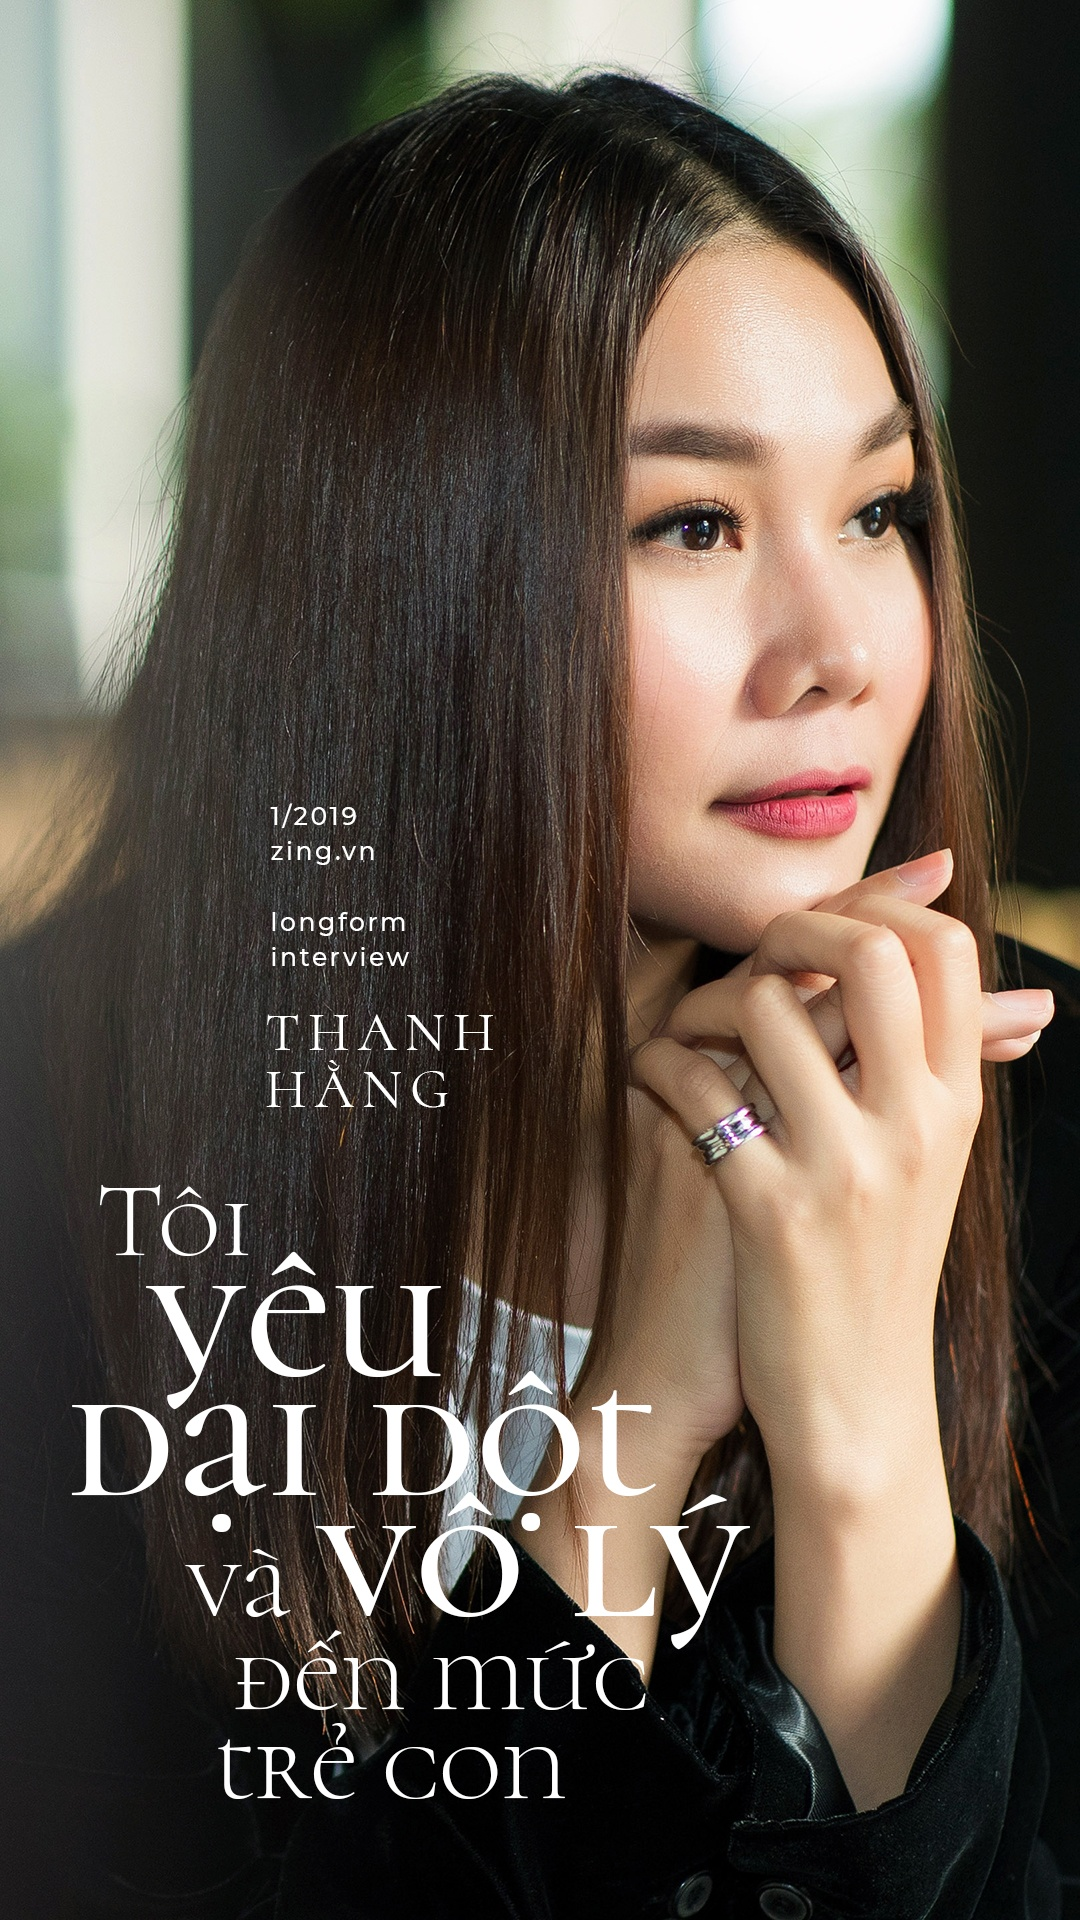 Huan luyen vien The Face 2018 Thanh Hang anh 1